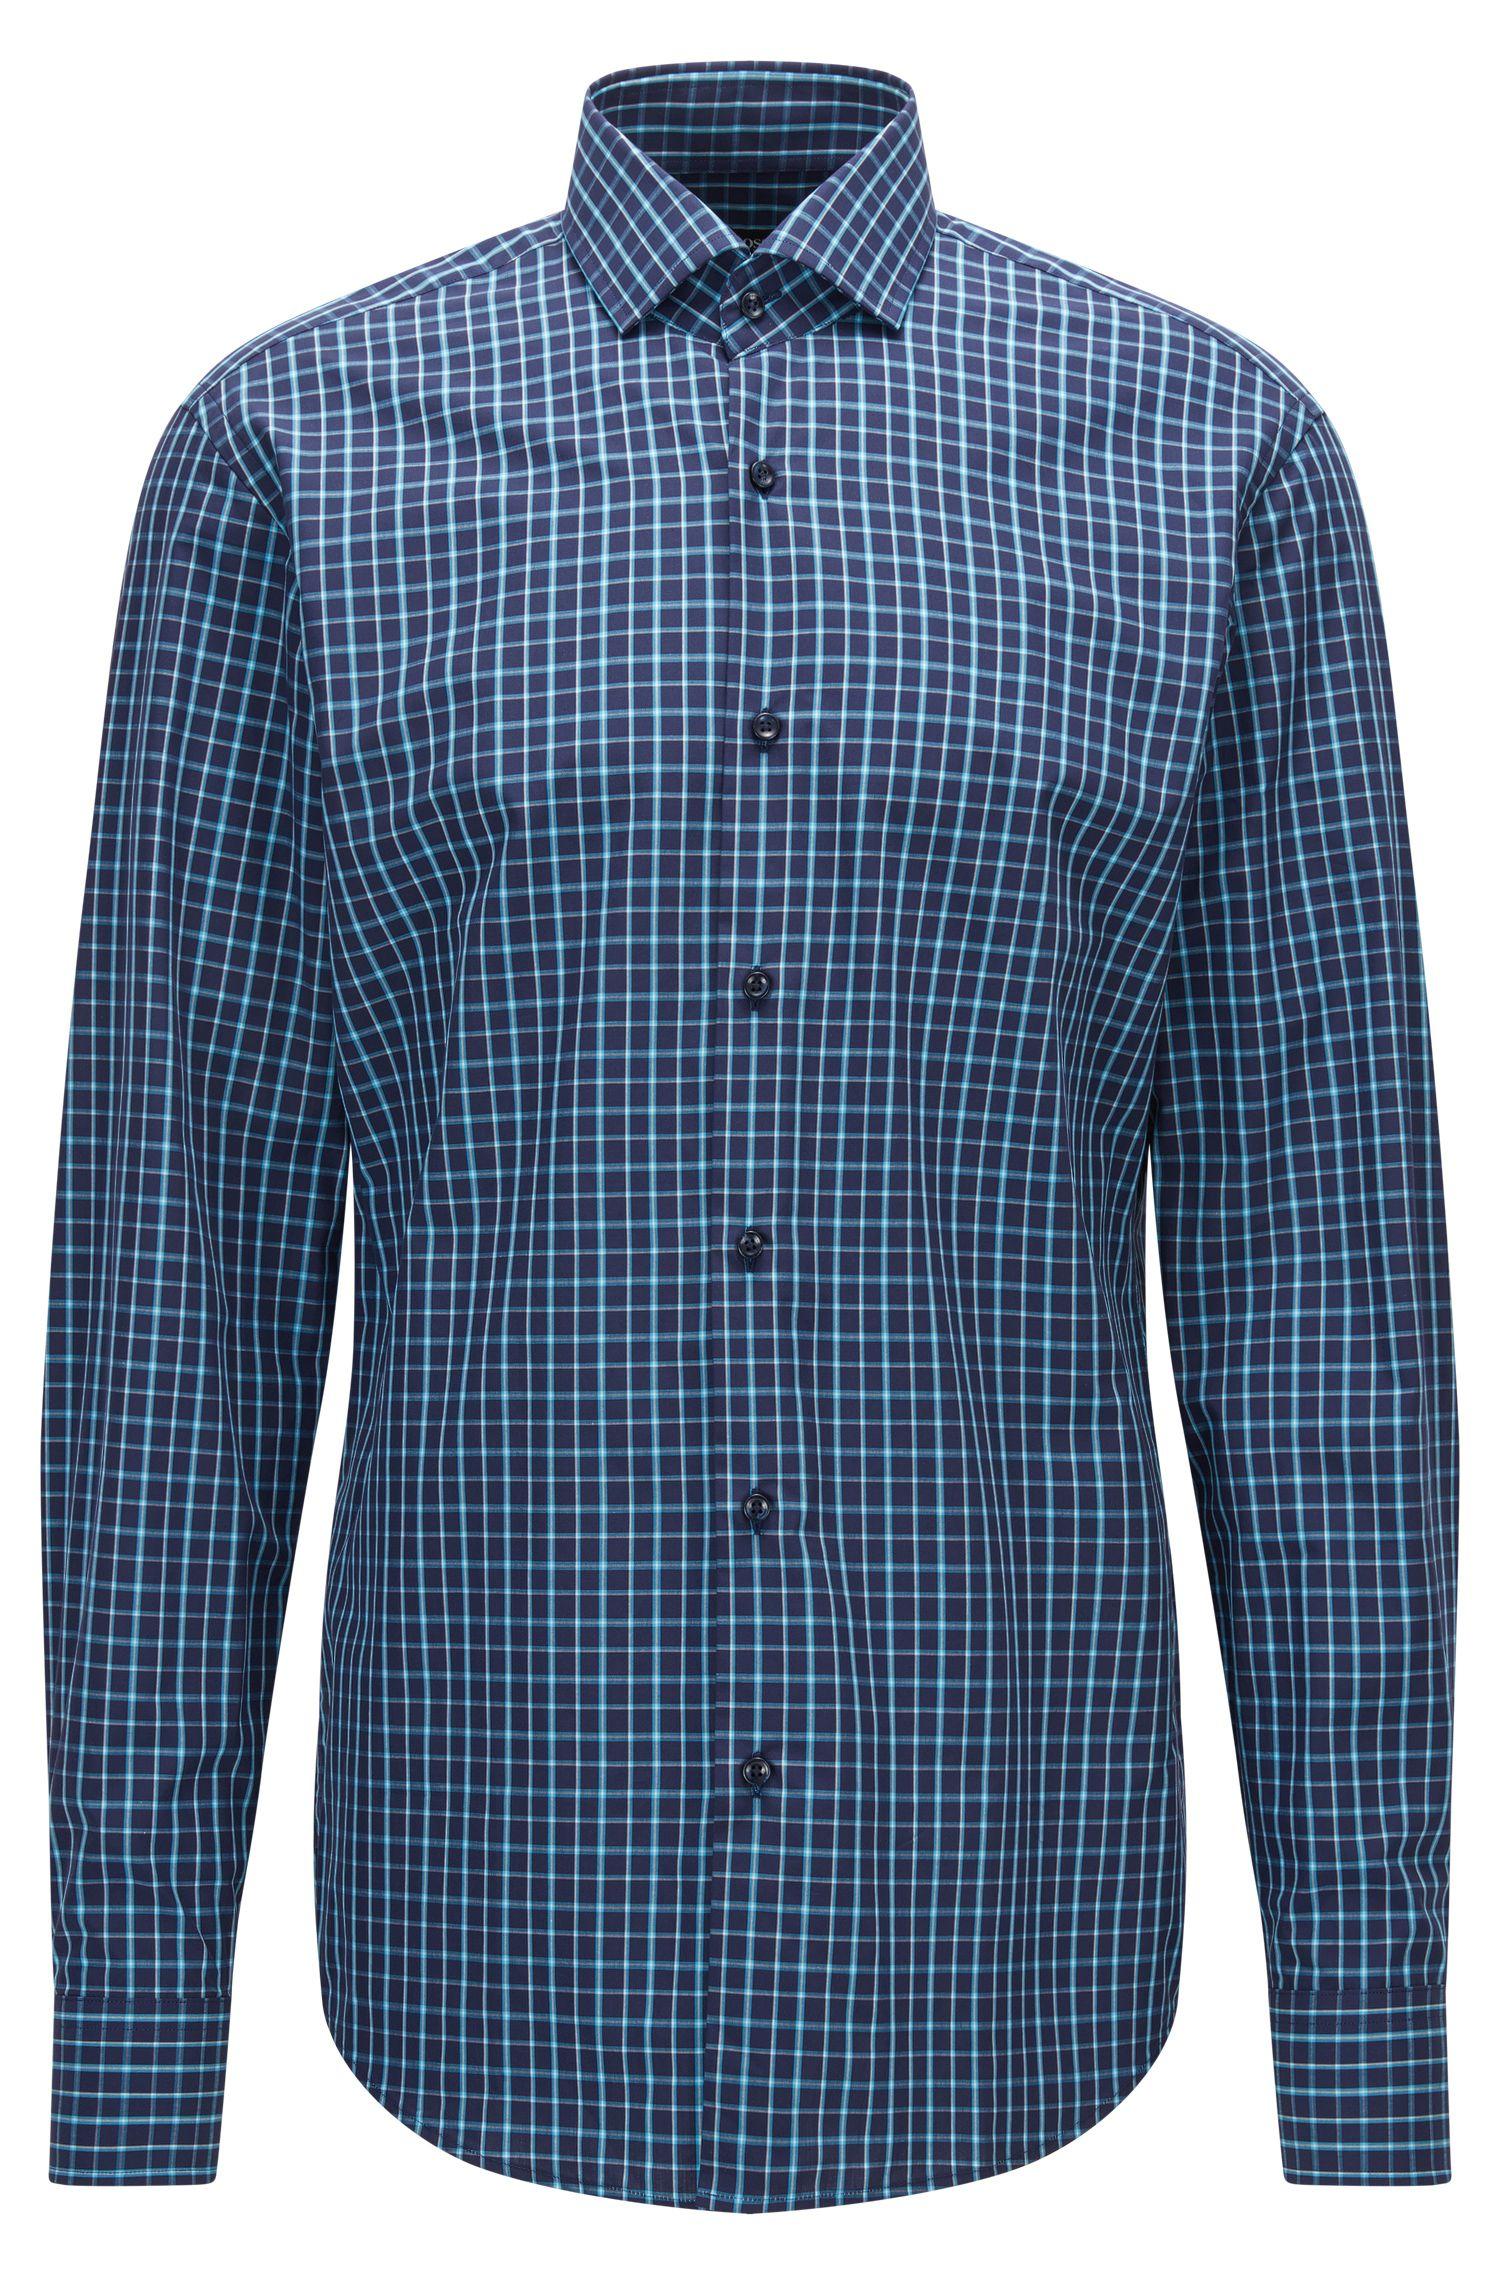 Double Windowpane Cotton Dress Shirt, Regular Fit | Gordon